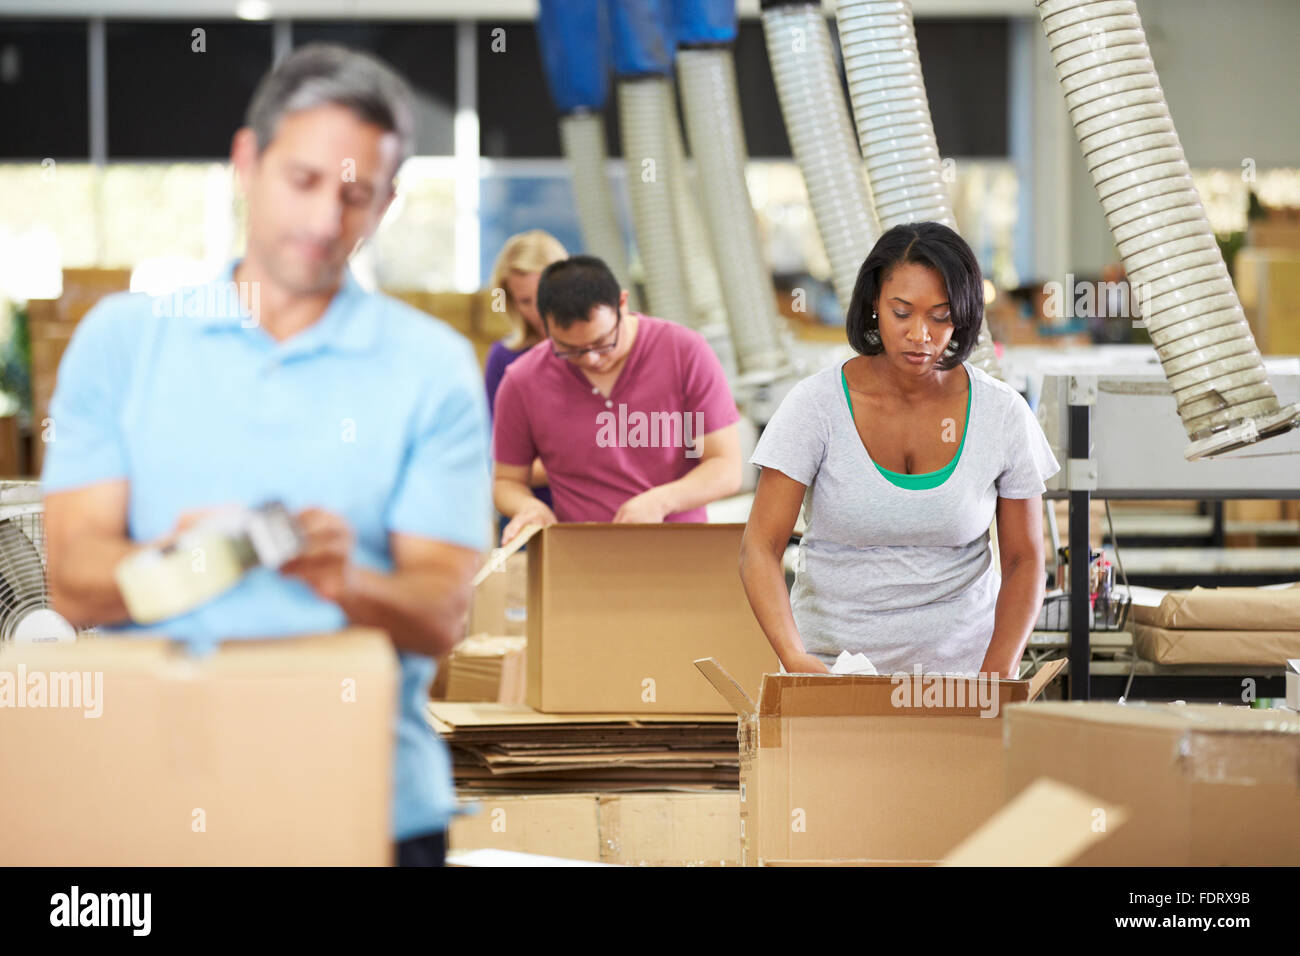 logistics packing waren warehouse clerk stock photo royalty stock photo logistics packing waren warehouse clerk